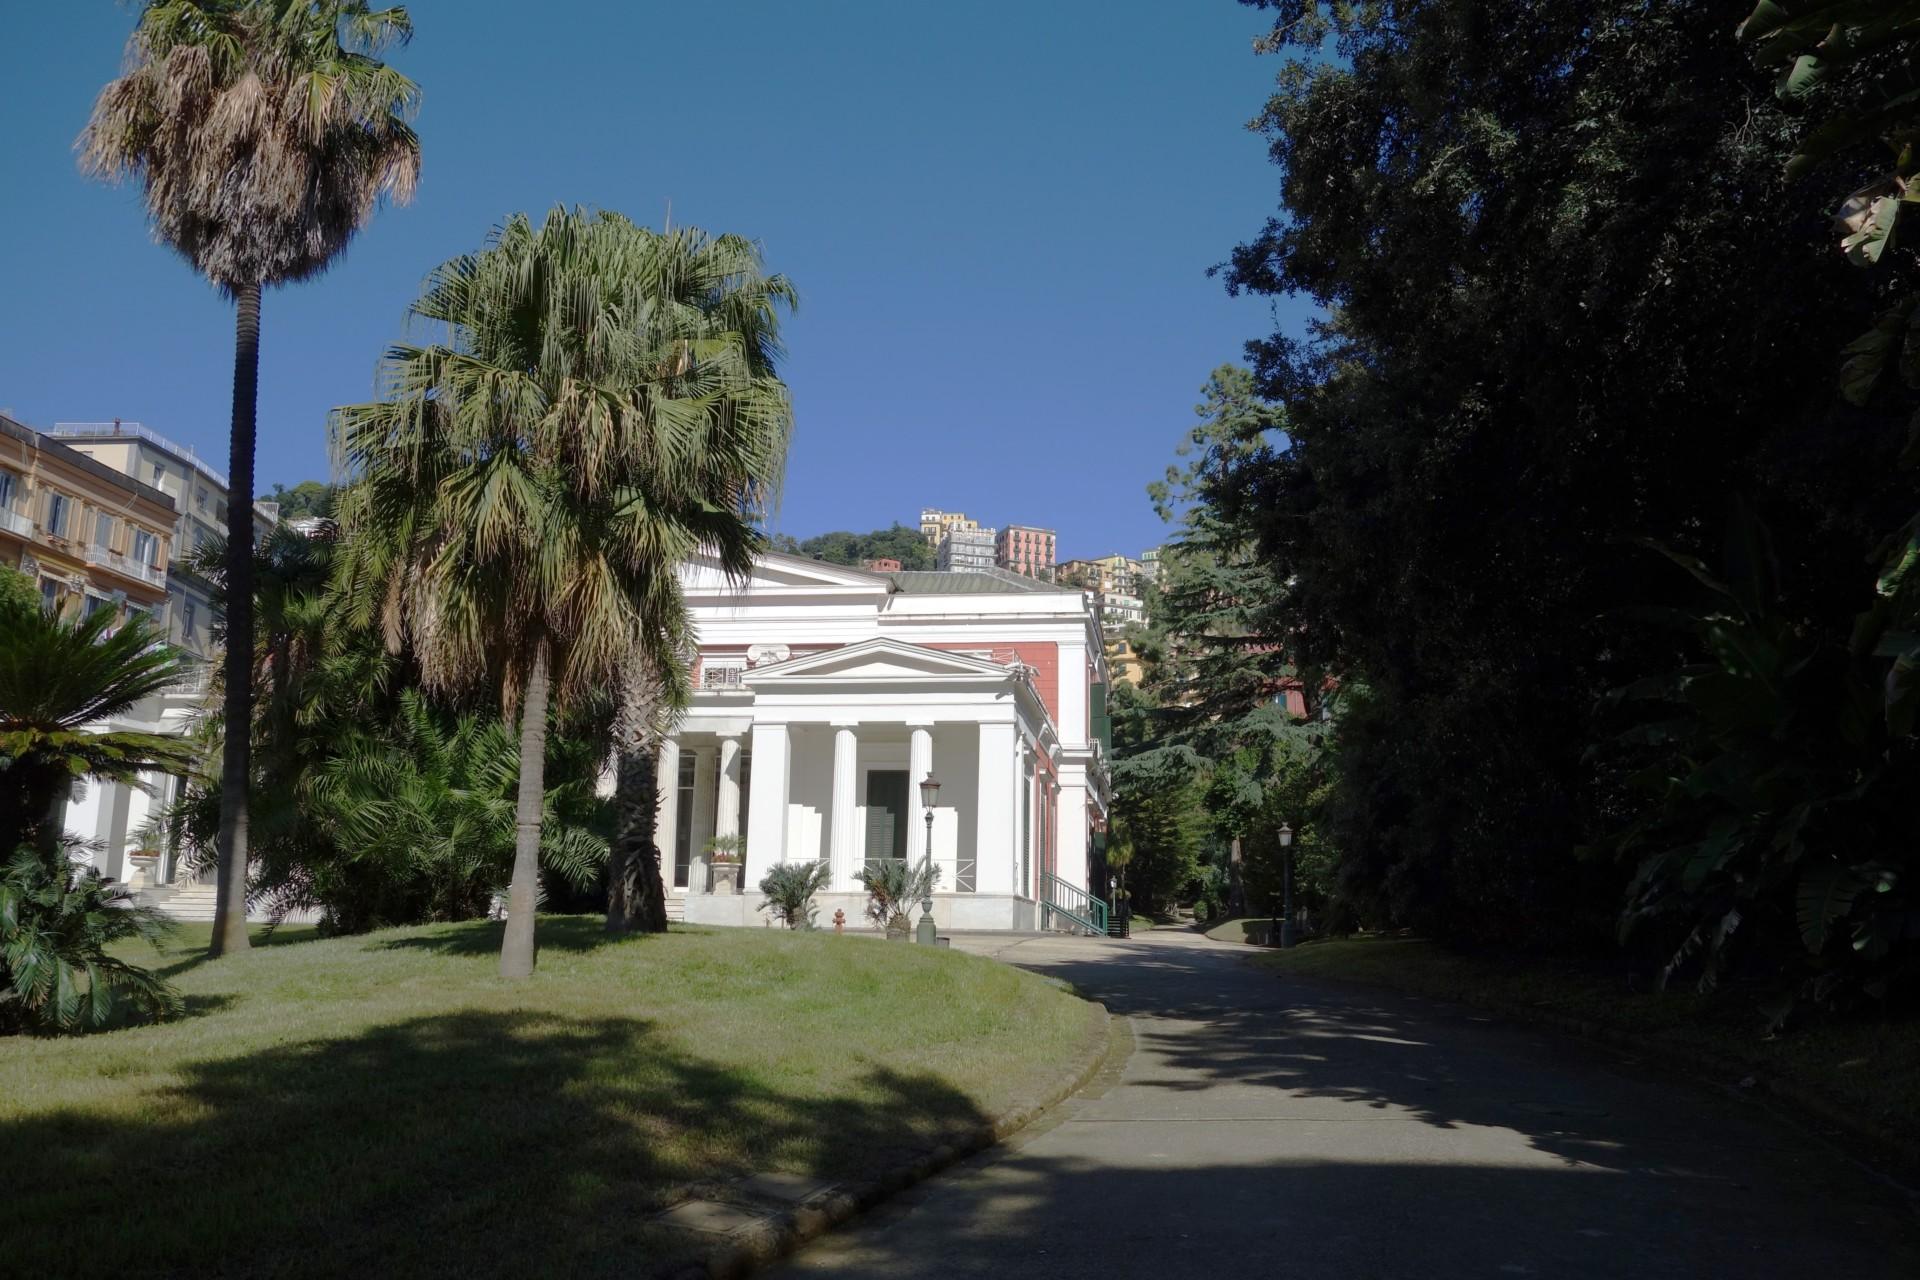 Villa Pignatelli, der erste Anblick